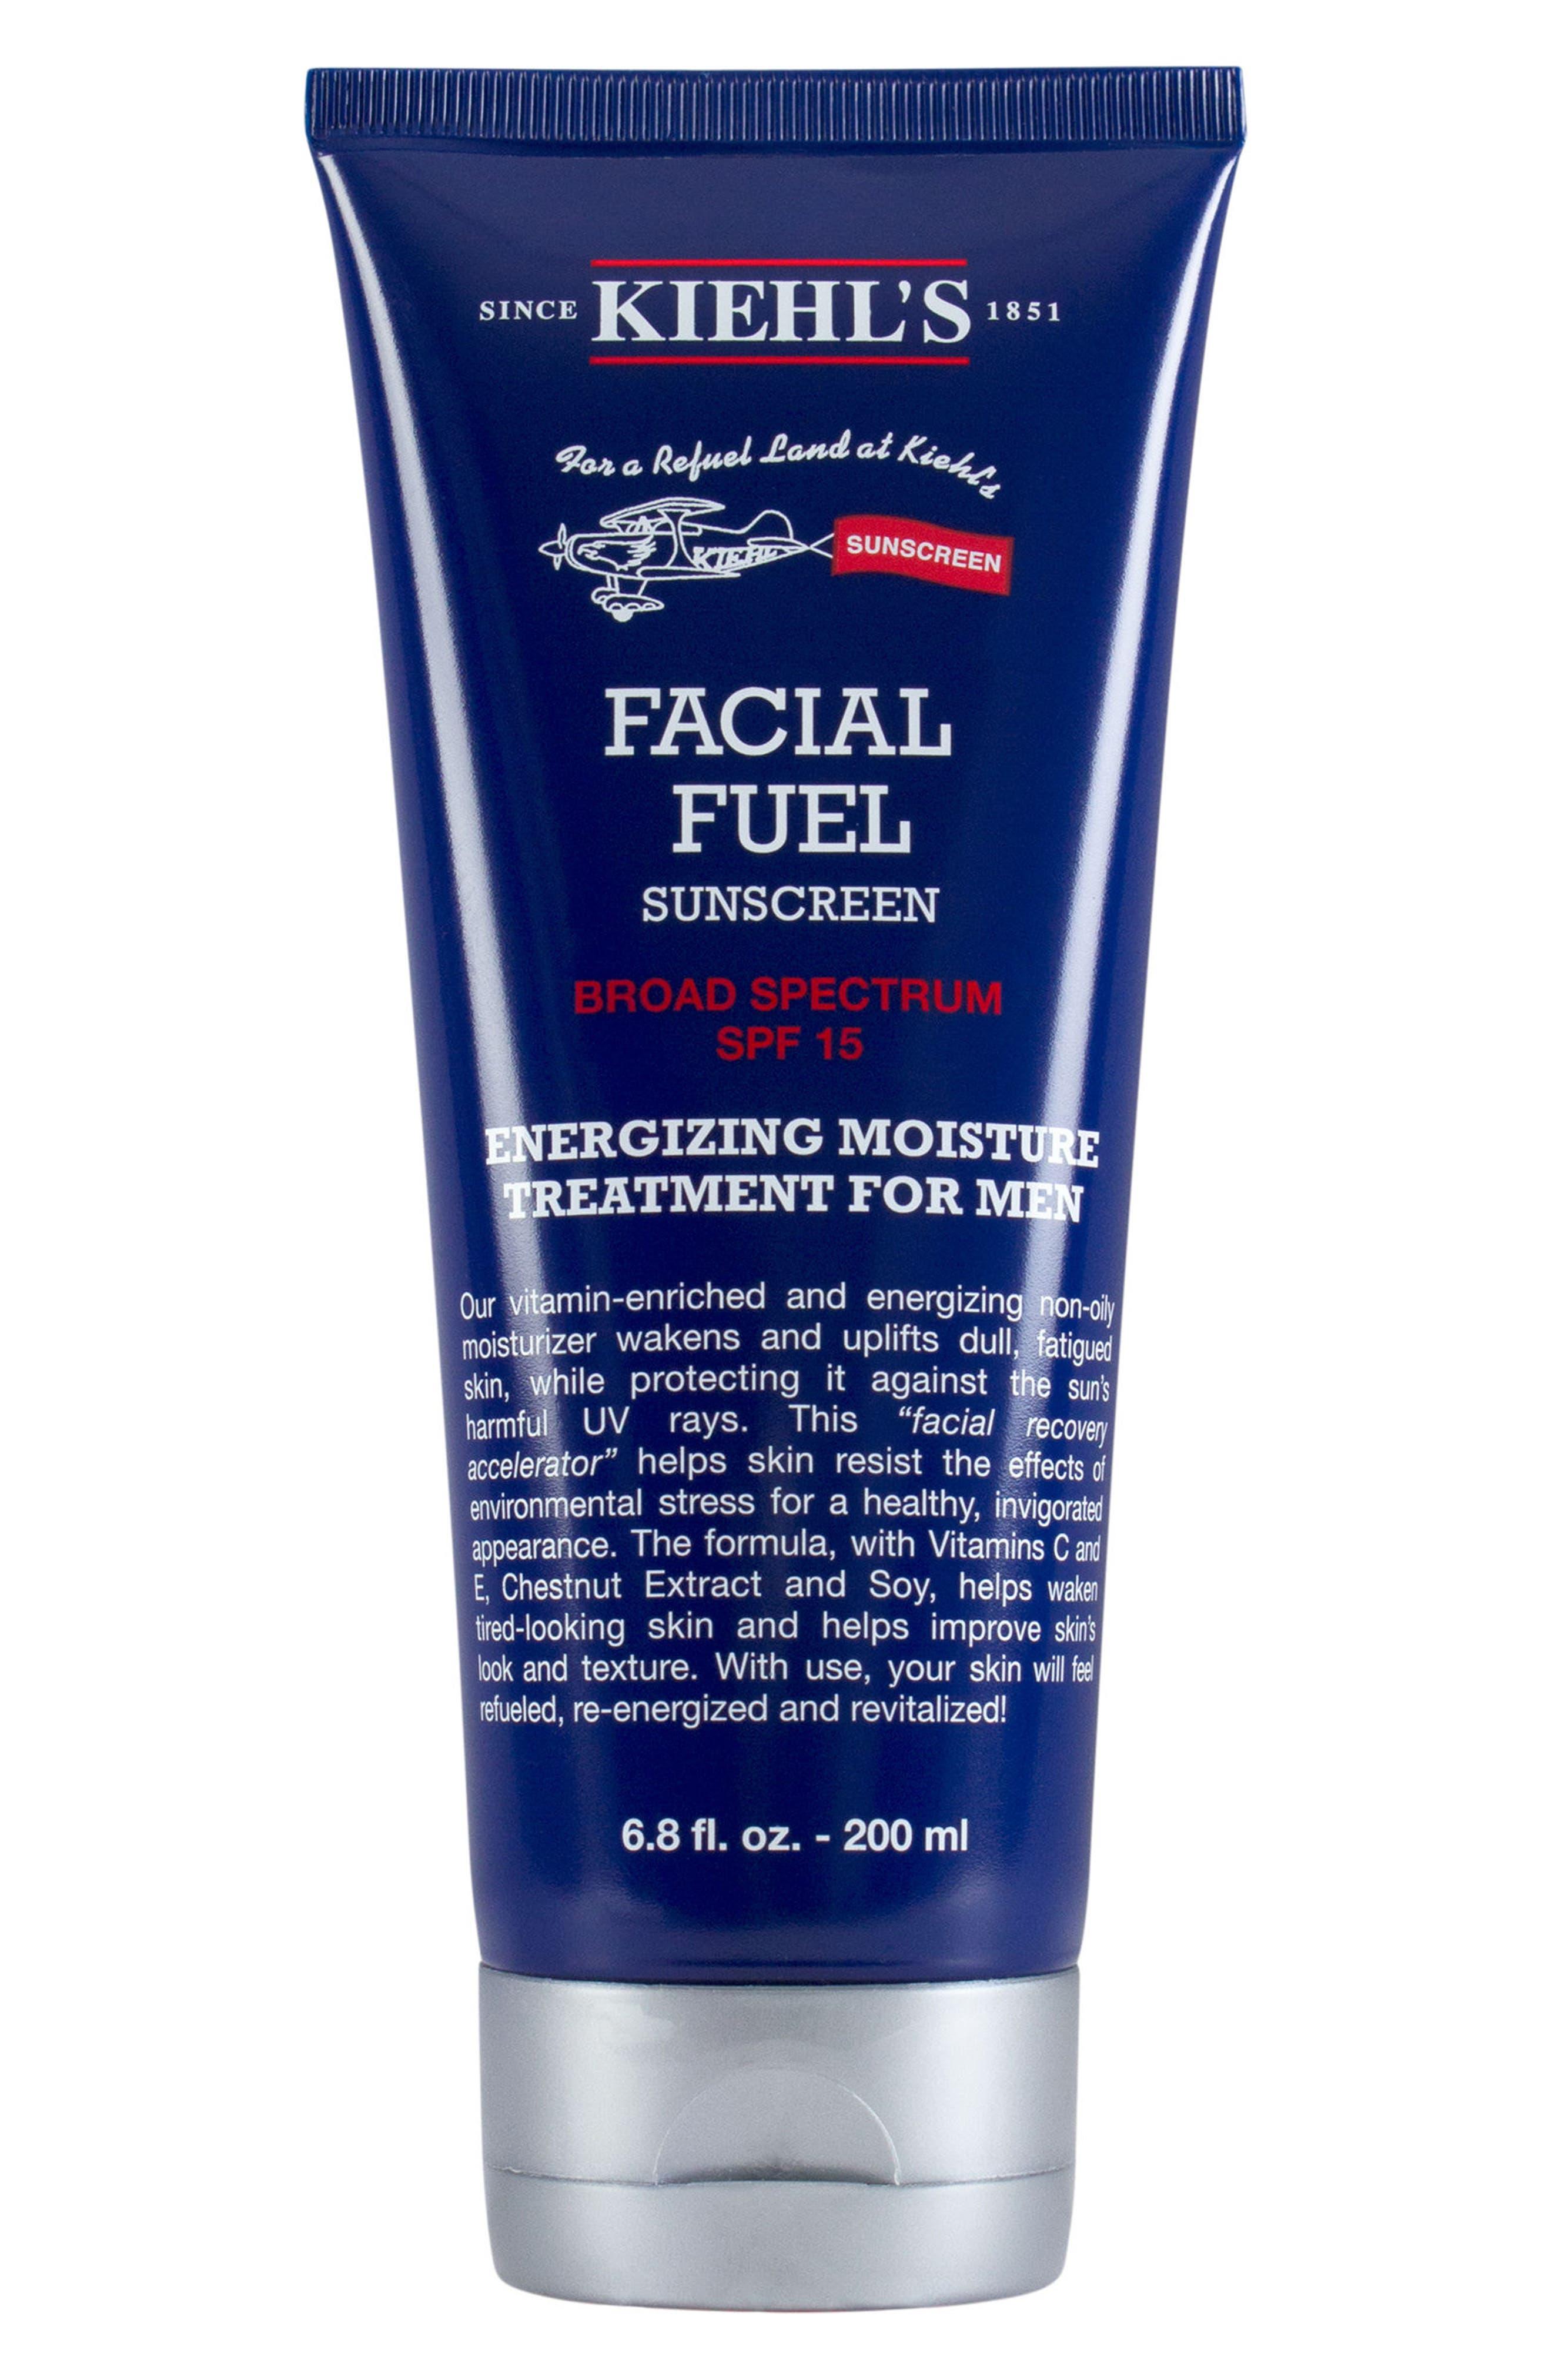 Facial Fuel Energizing Moisture Treatment for Men SPF 15,                             Main thumbnail 1, color,                             NONE